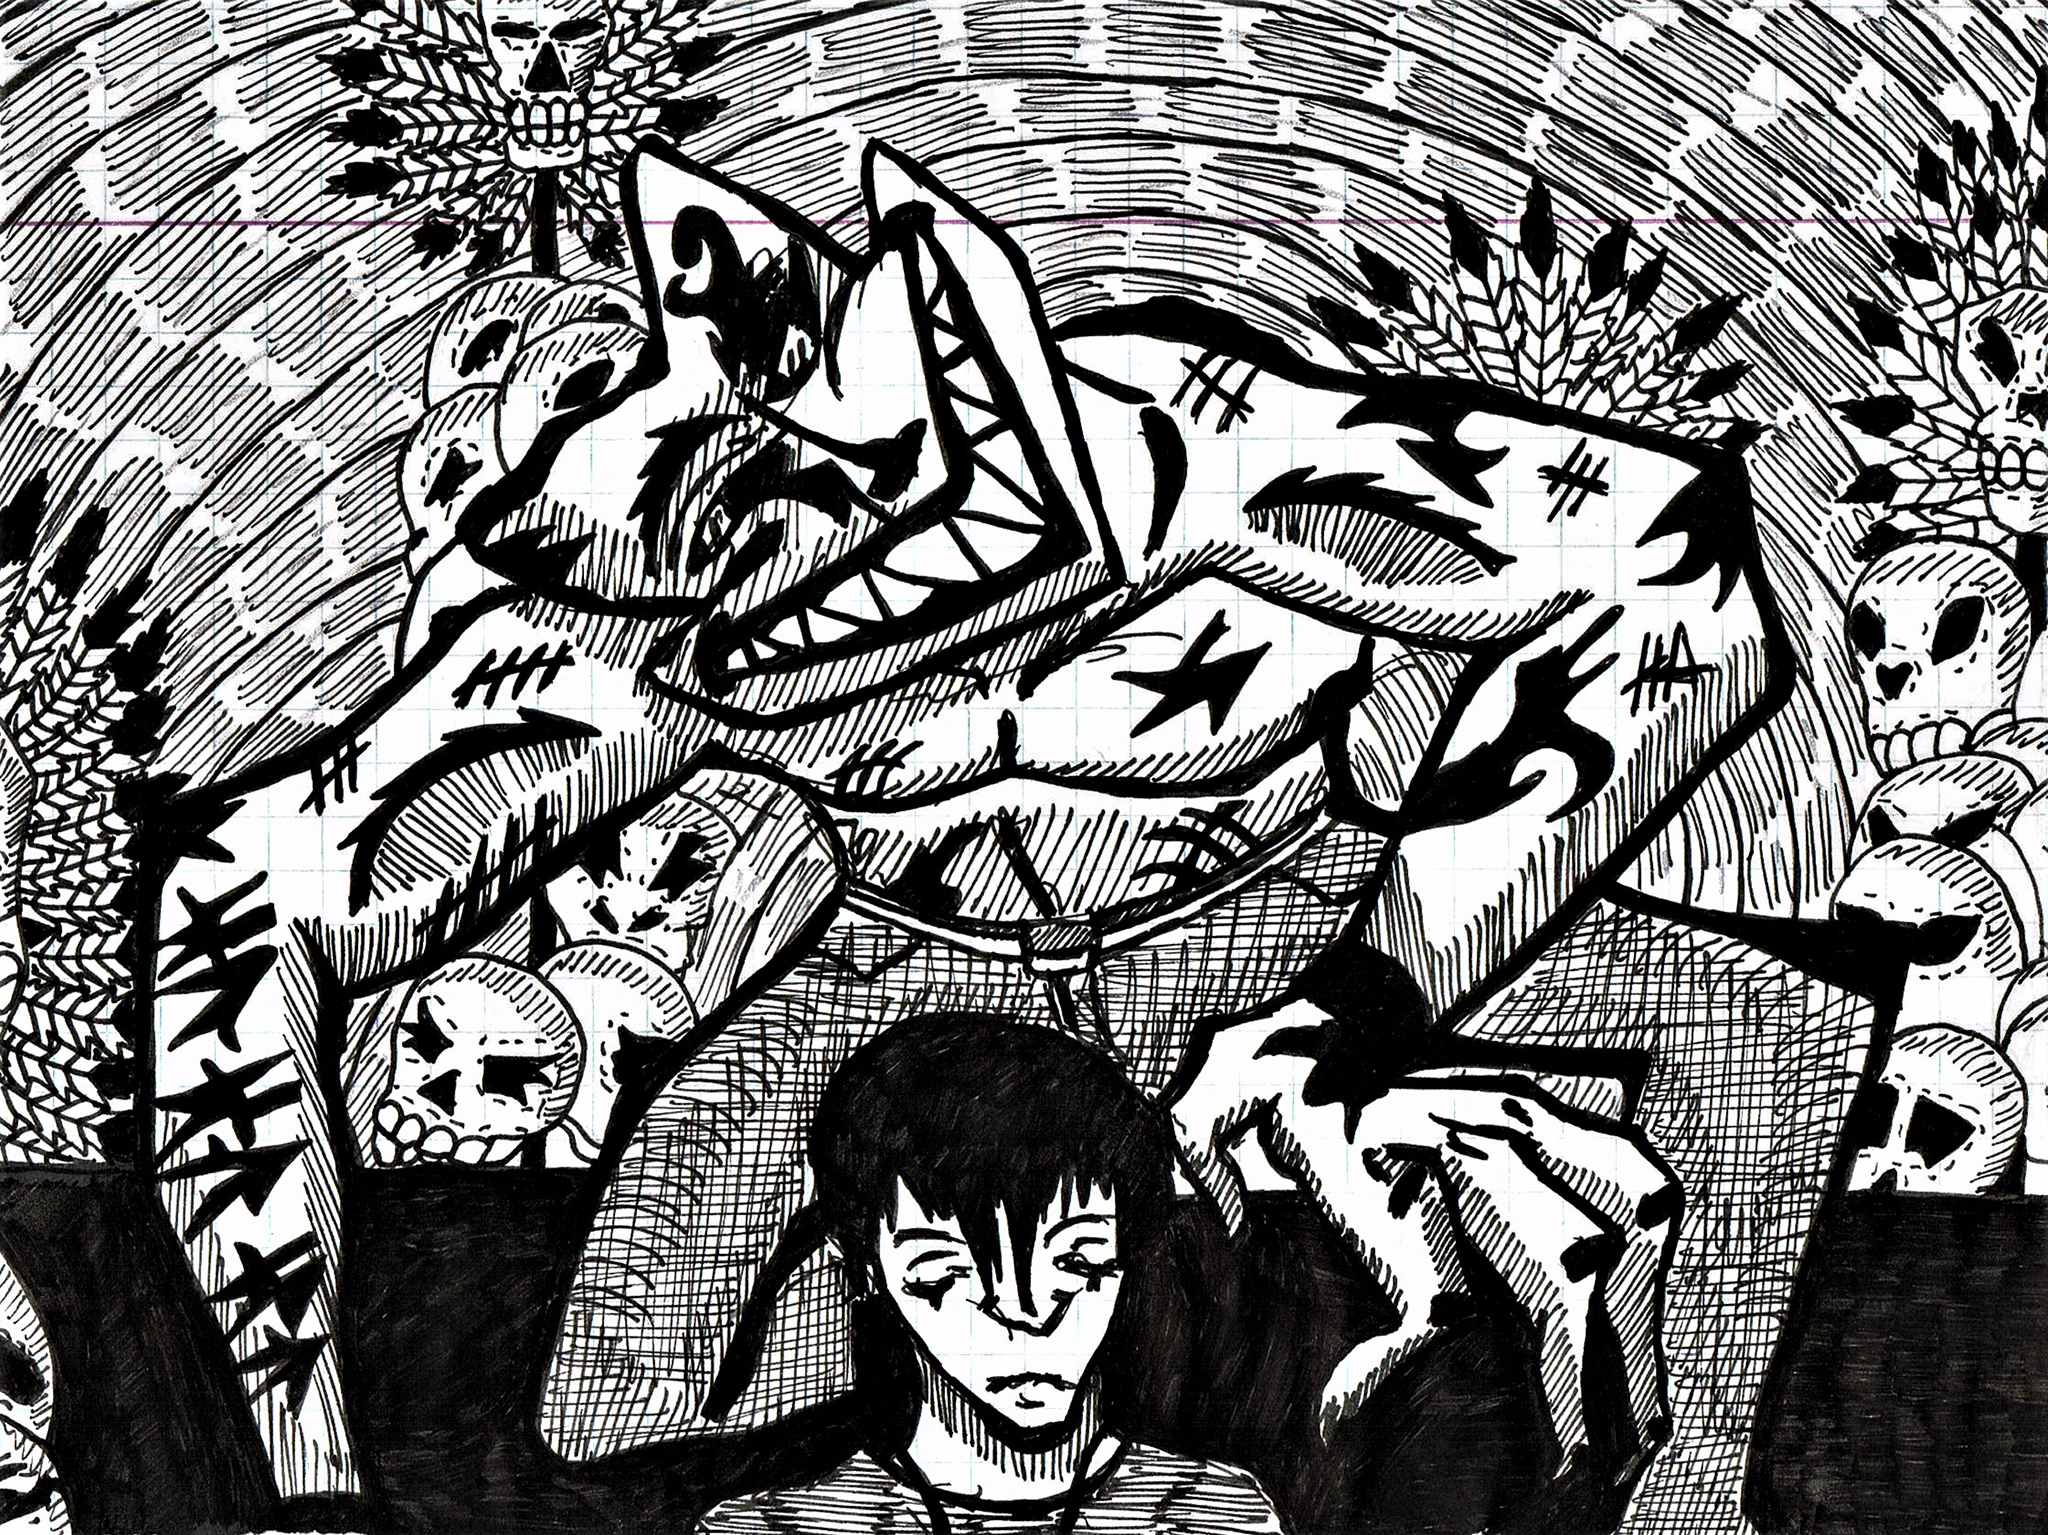 Emil Sedzikowski Illustration and Design